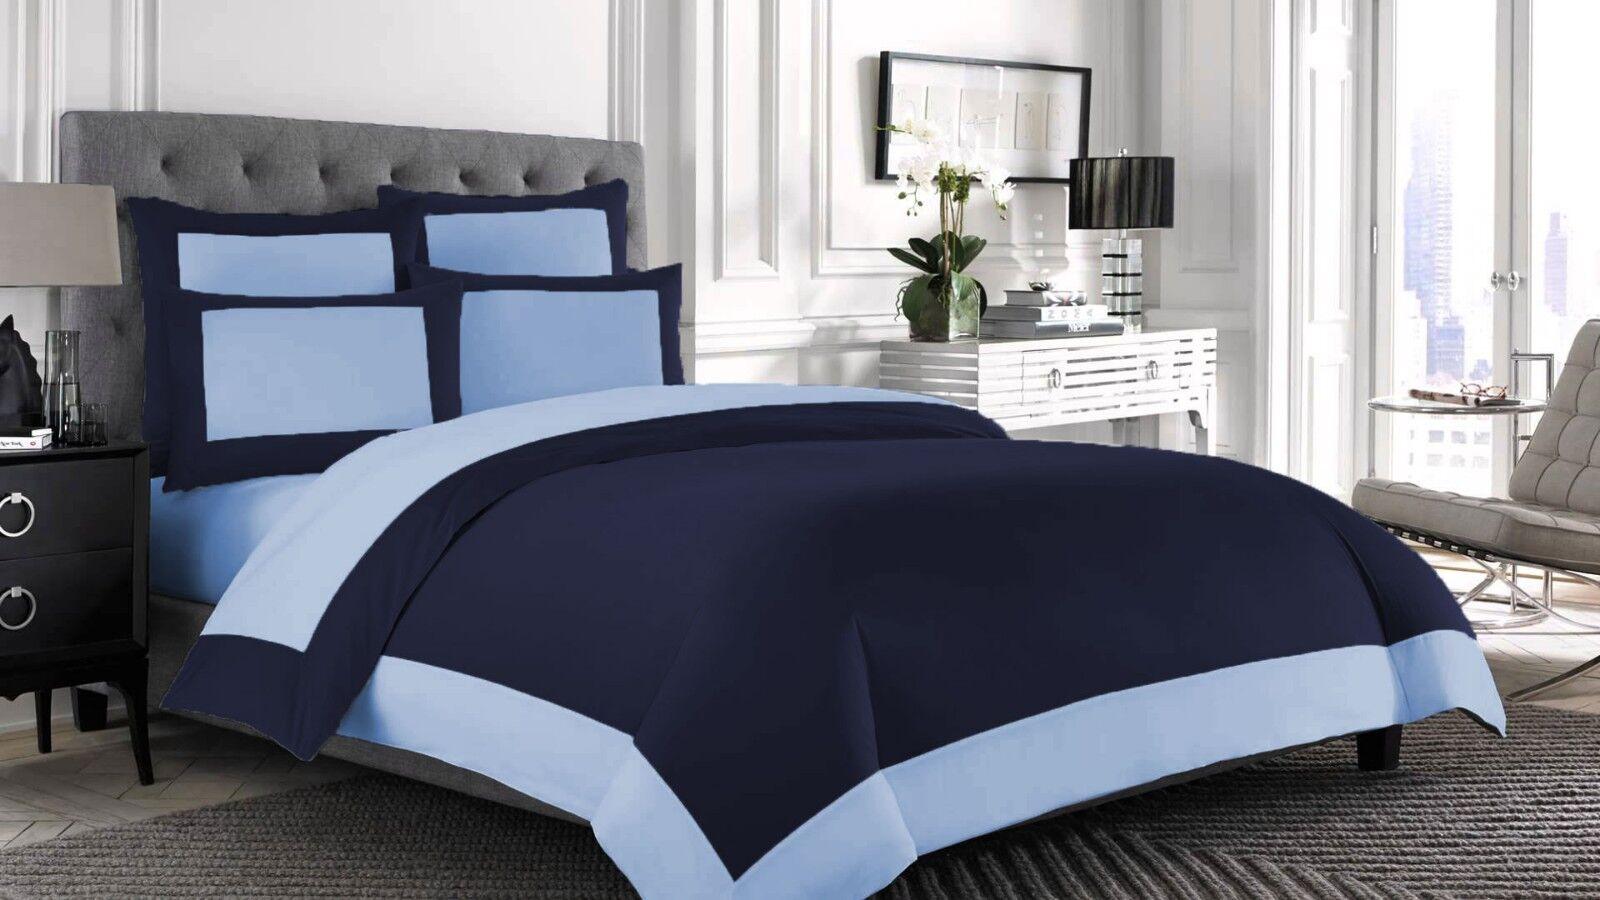 King Size Designer Reversible Duvet cover set 100% Egyptian Cotton Choose color